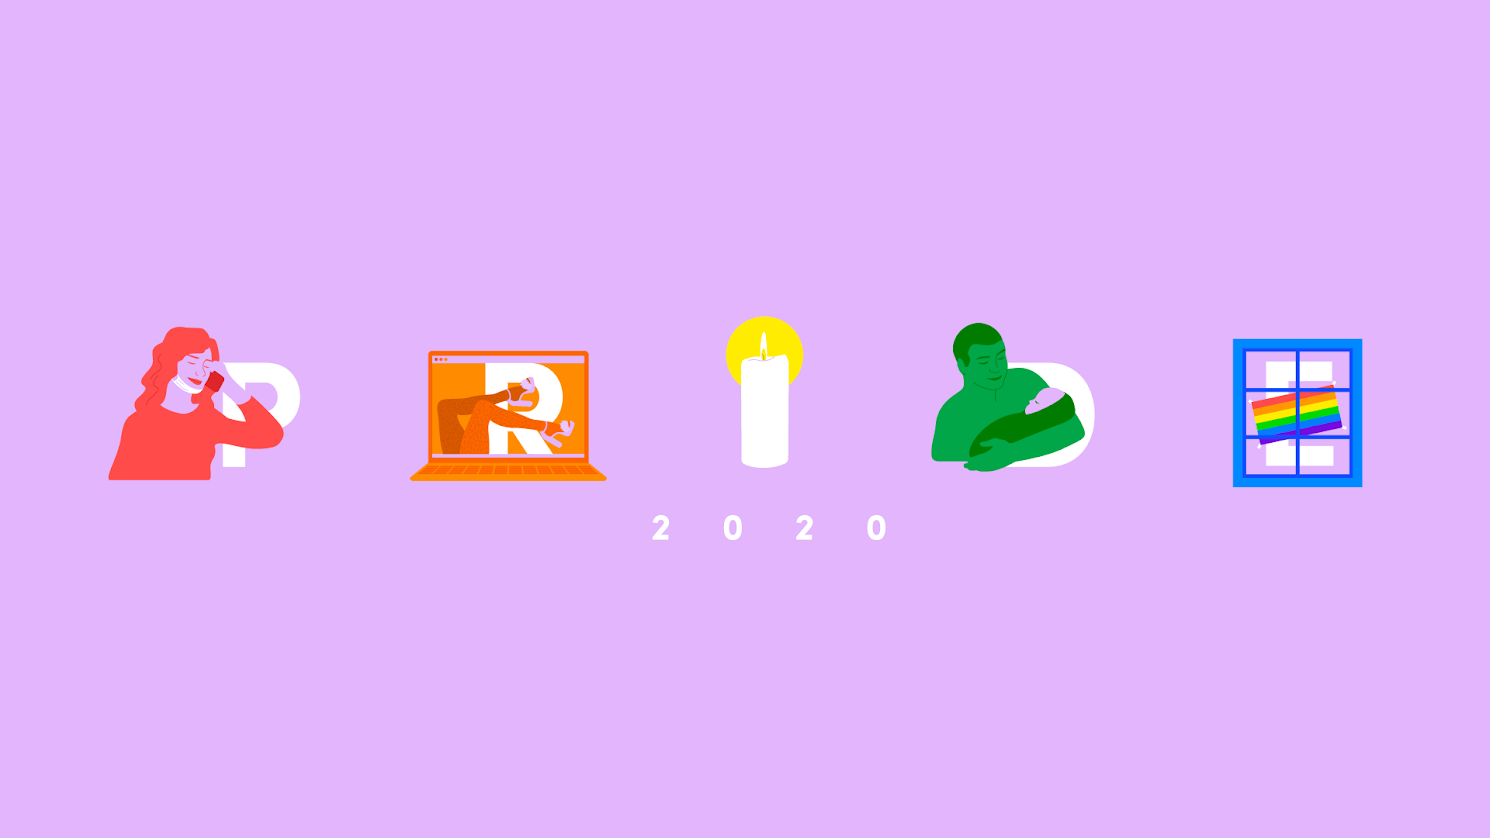 The BuzzFeed 2020 Pride logo